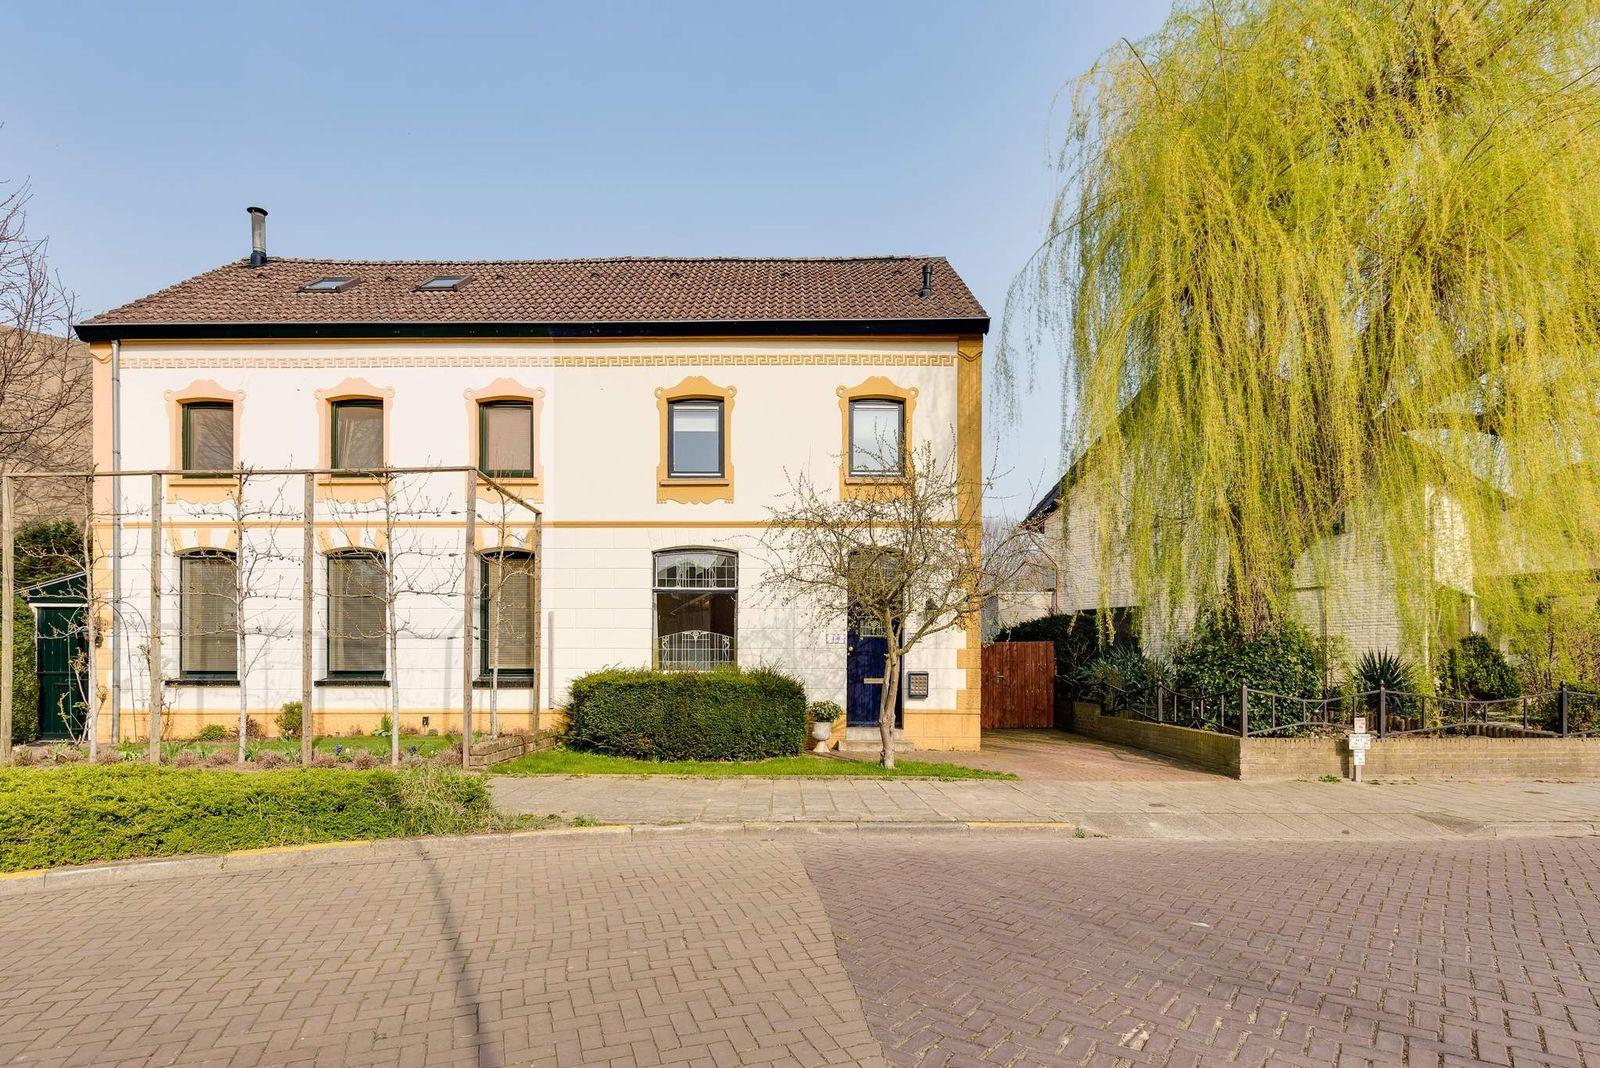 Oude Heerlenerweg 18, Sittard